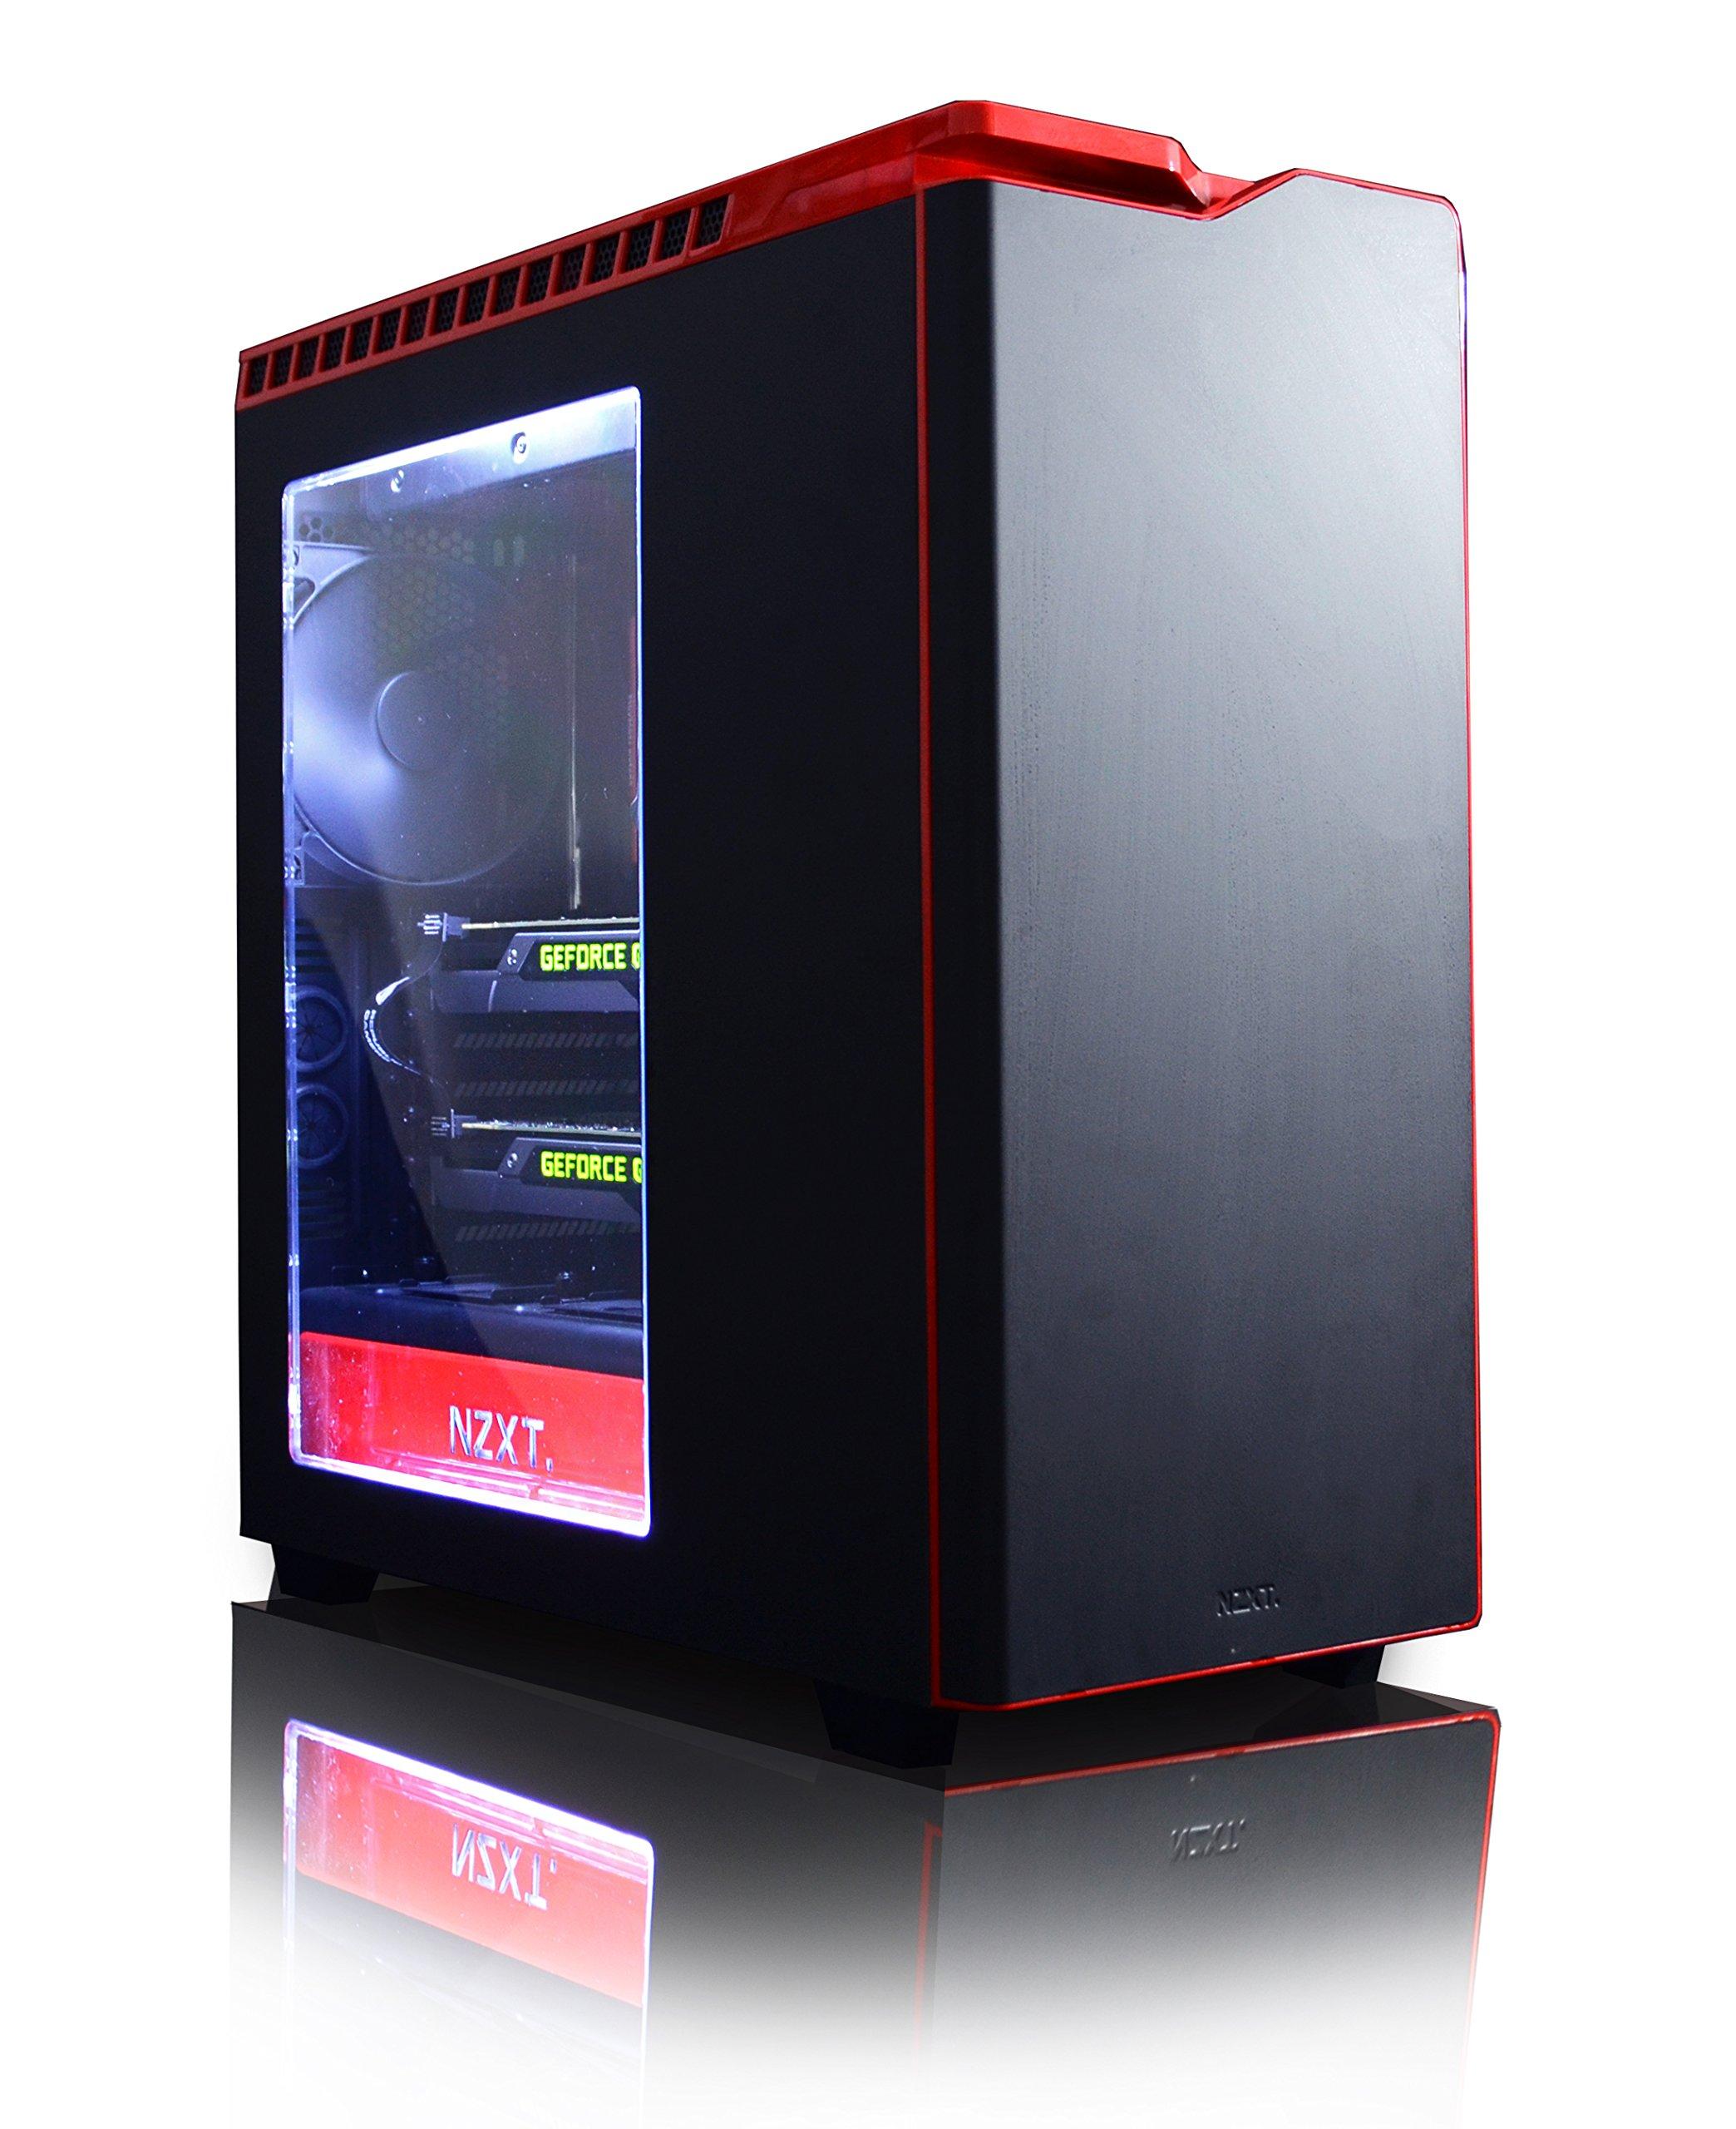 VIBOX Legend 5 Gaming PC Computer mit War Thunder Spiel Bundle, Windows 10 OS (4,5GHz Intel i9 Extreme 10-Core Prozessor…